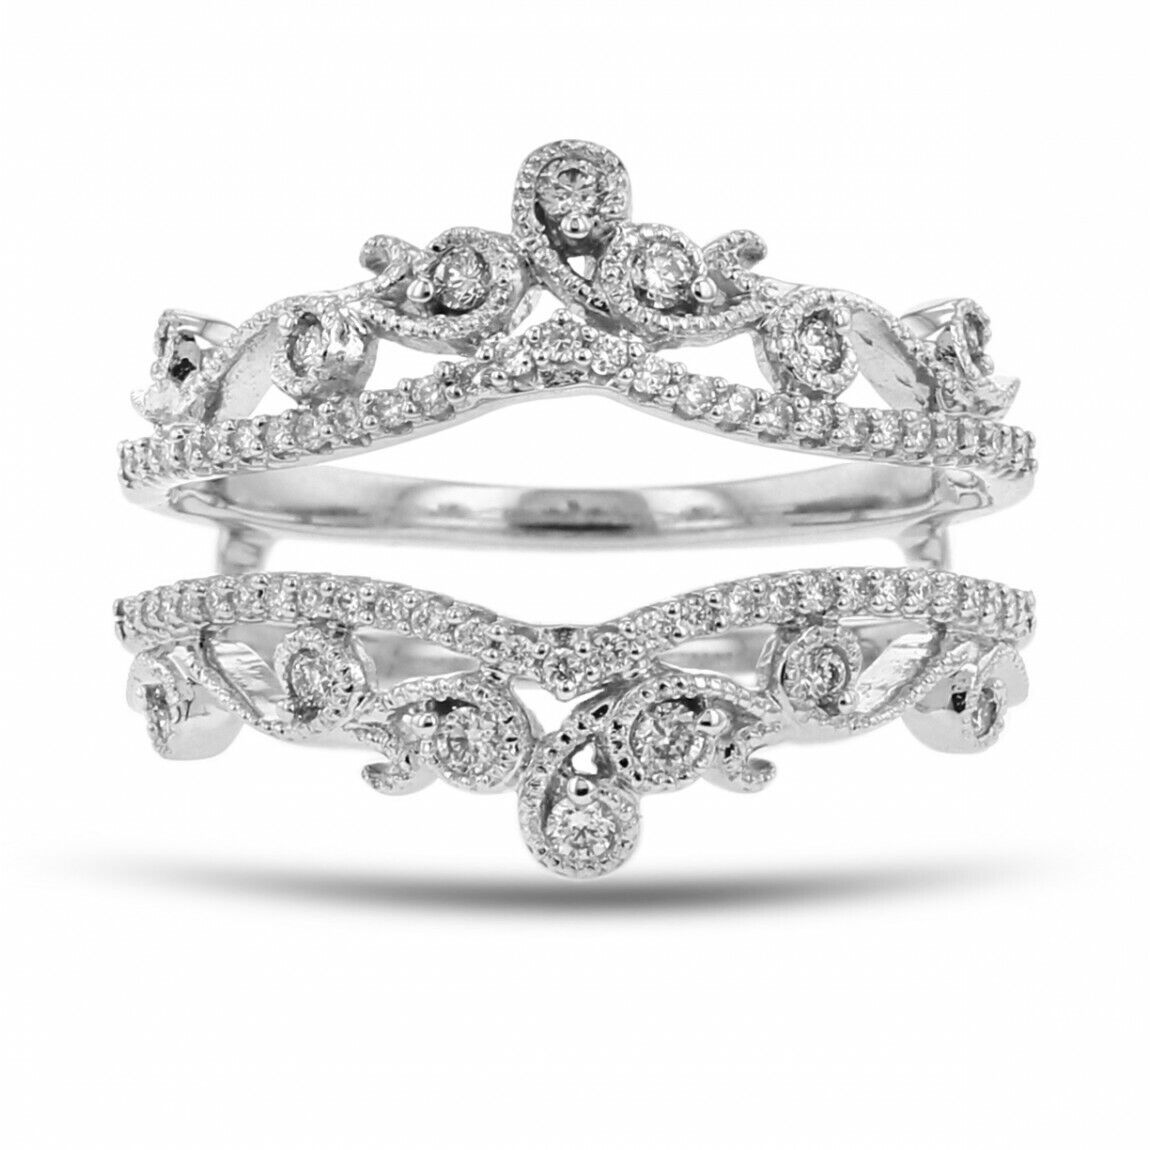 0.55 Ct Round Cut Diamond 18k White Gold Over Enhancer Wrap